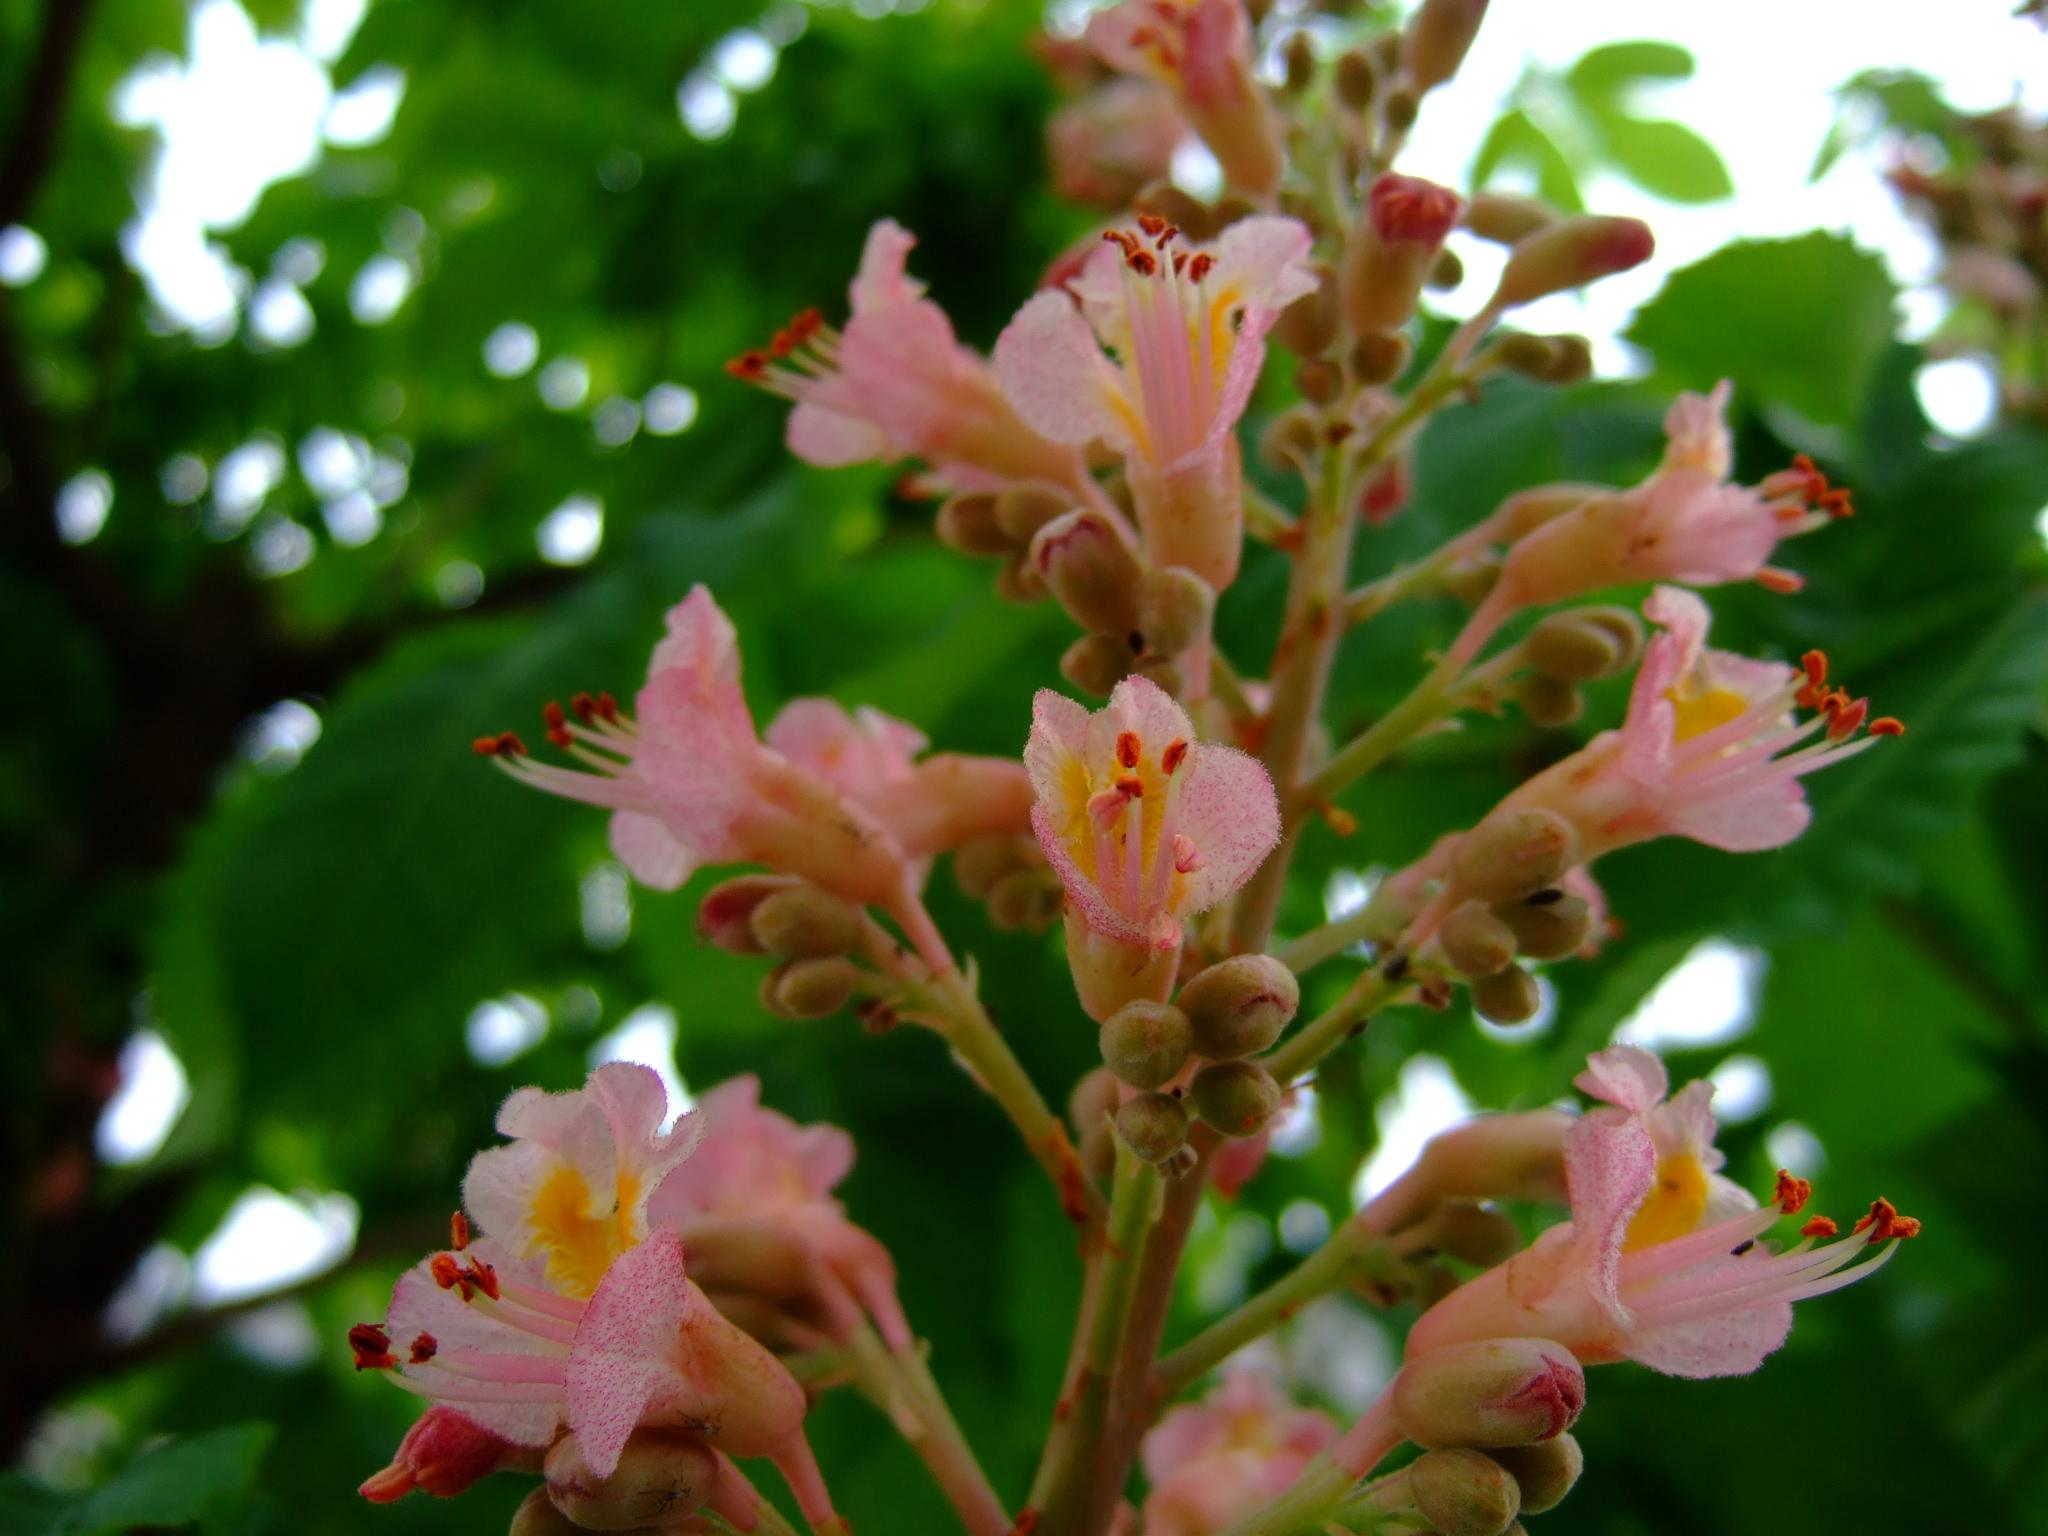 Dscf0773 マロニエ 街路樹のマロニエがピンクの花を咲かせ始めた。この花を見ると ああ,ゴ